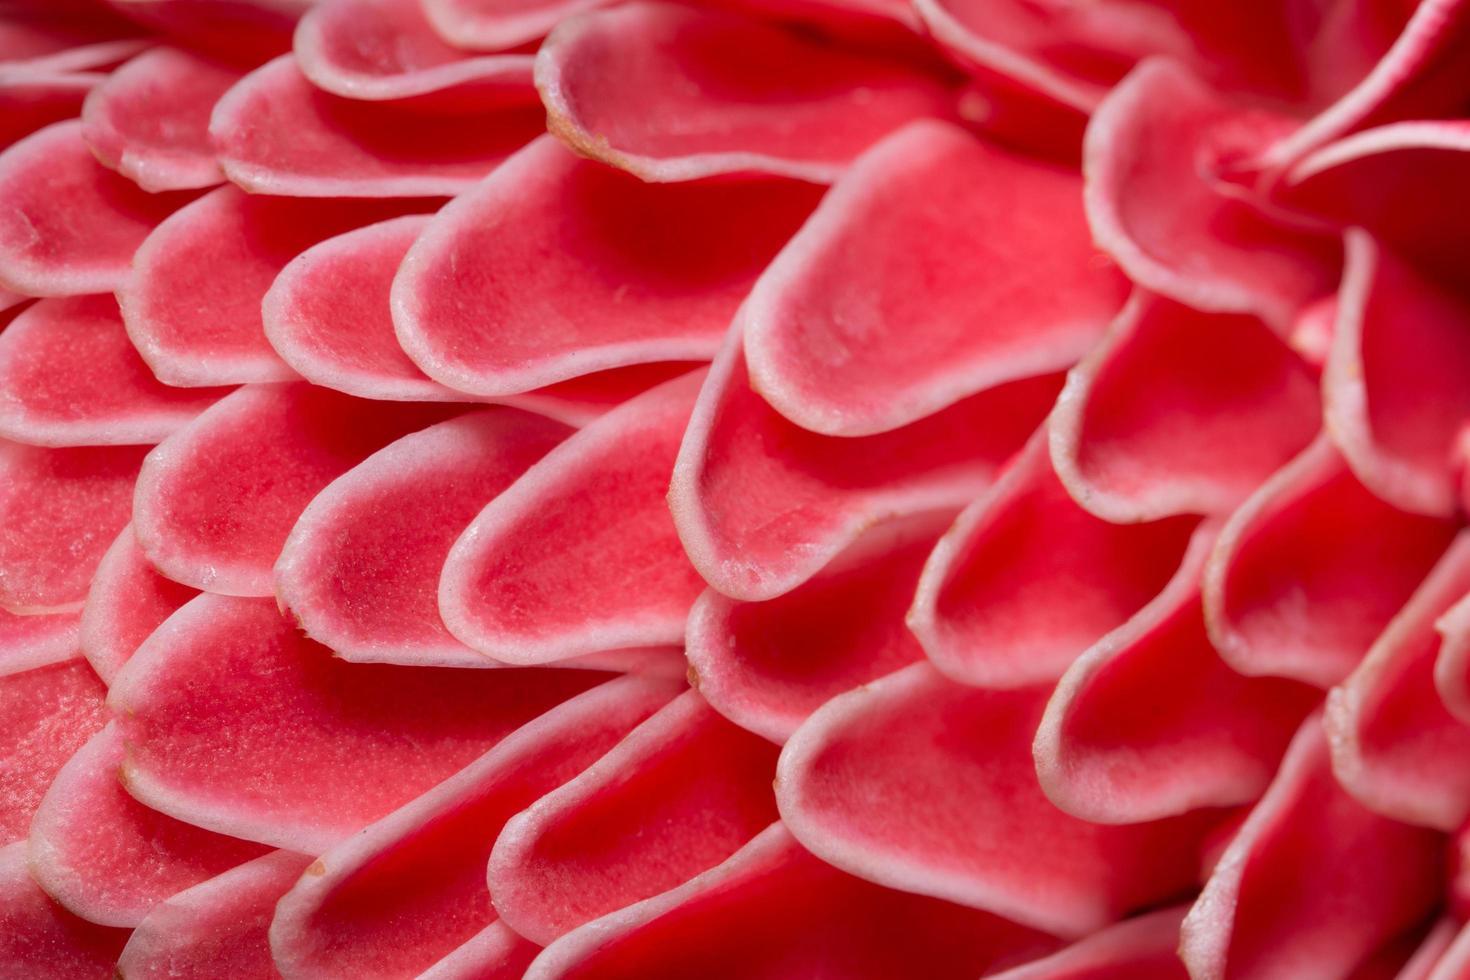 roze bloemblaadjes close-up foto